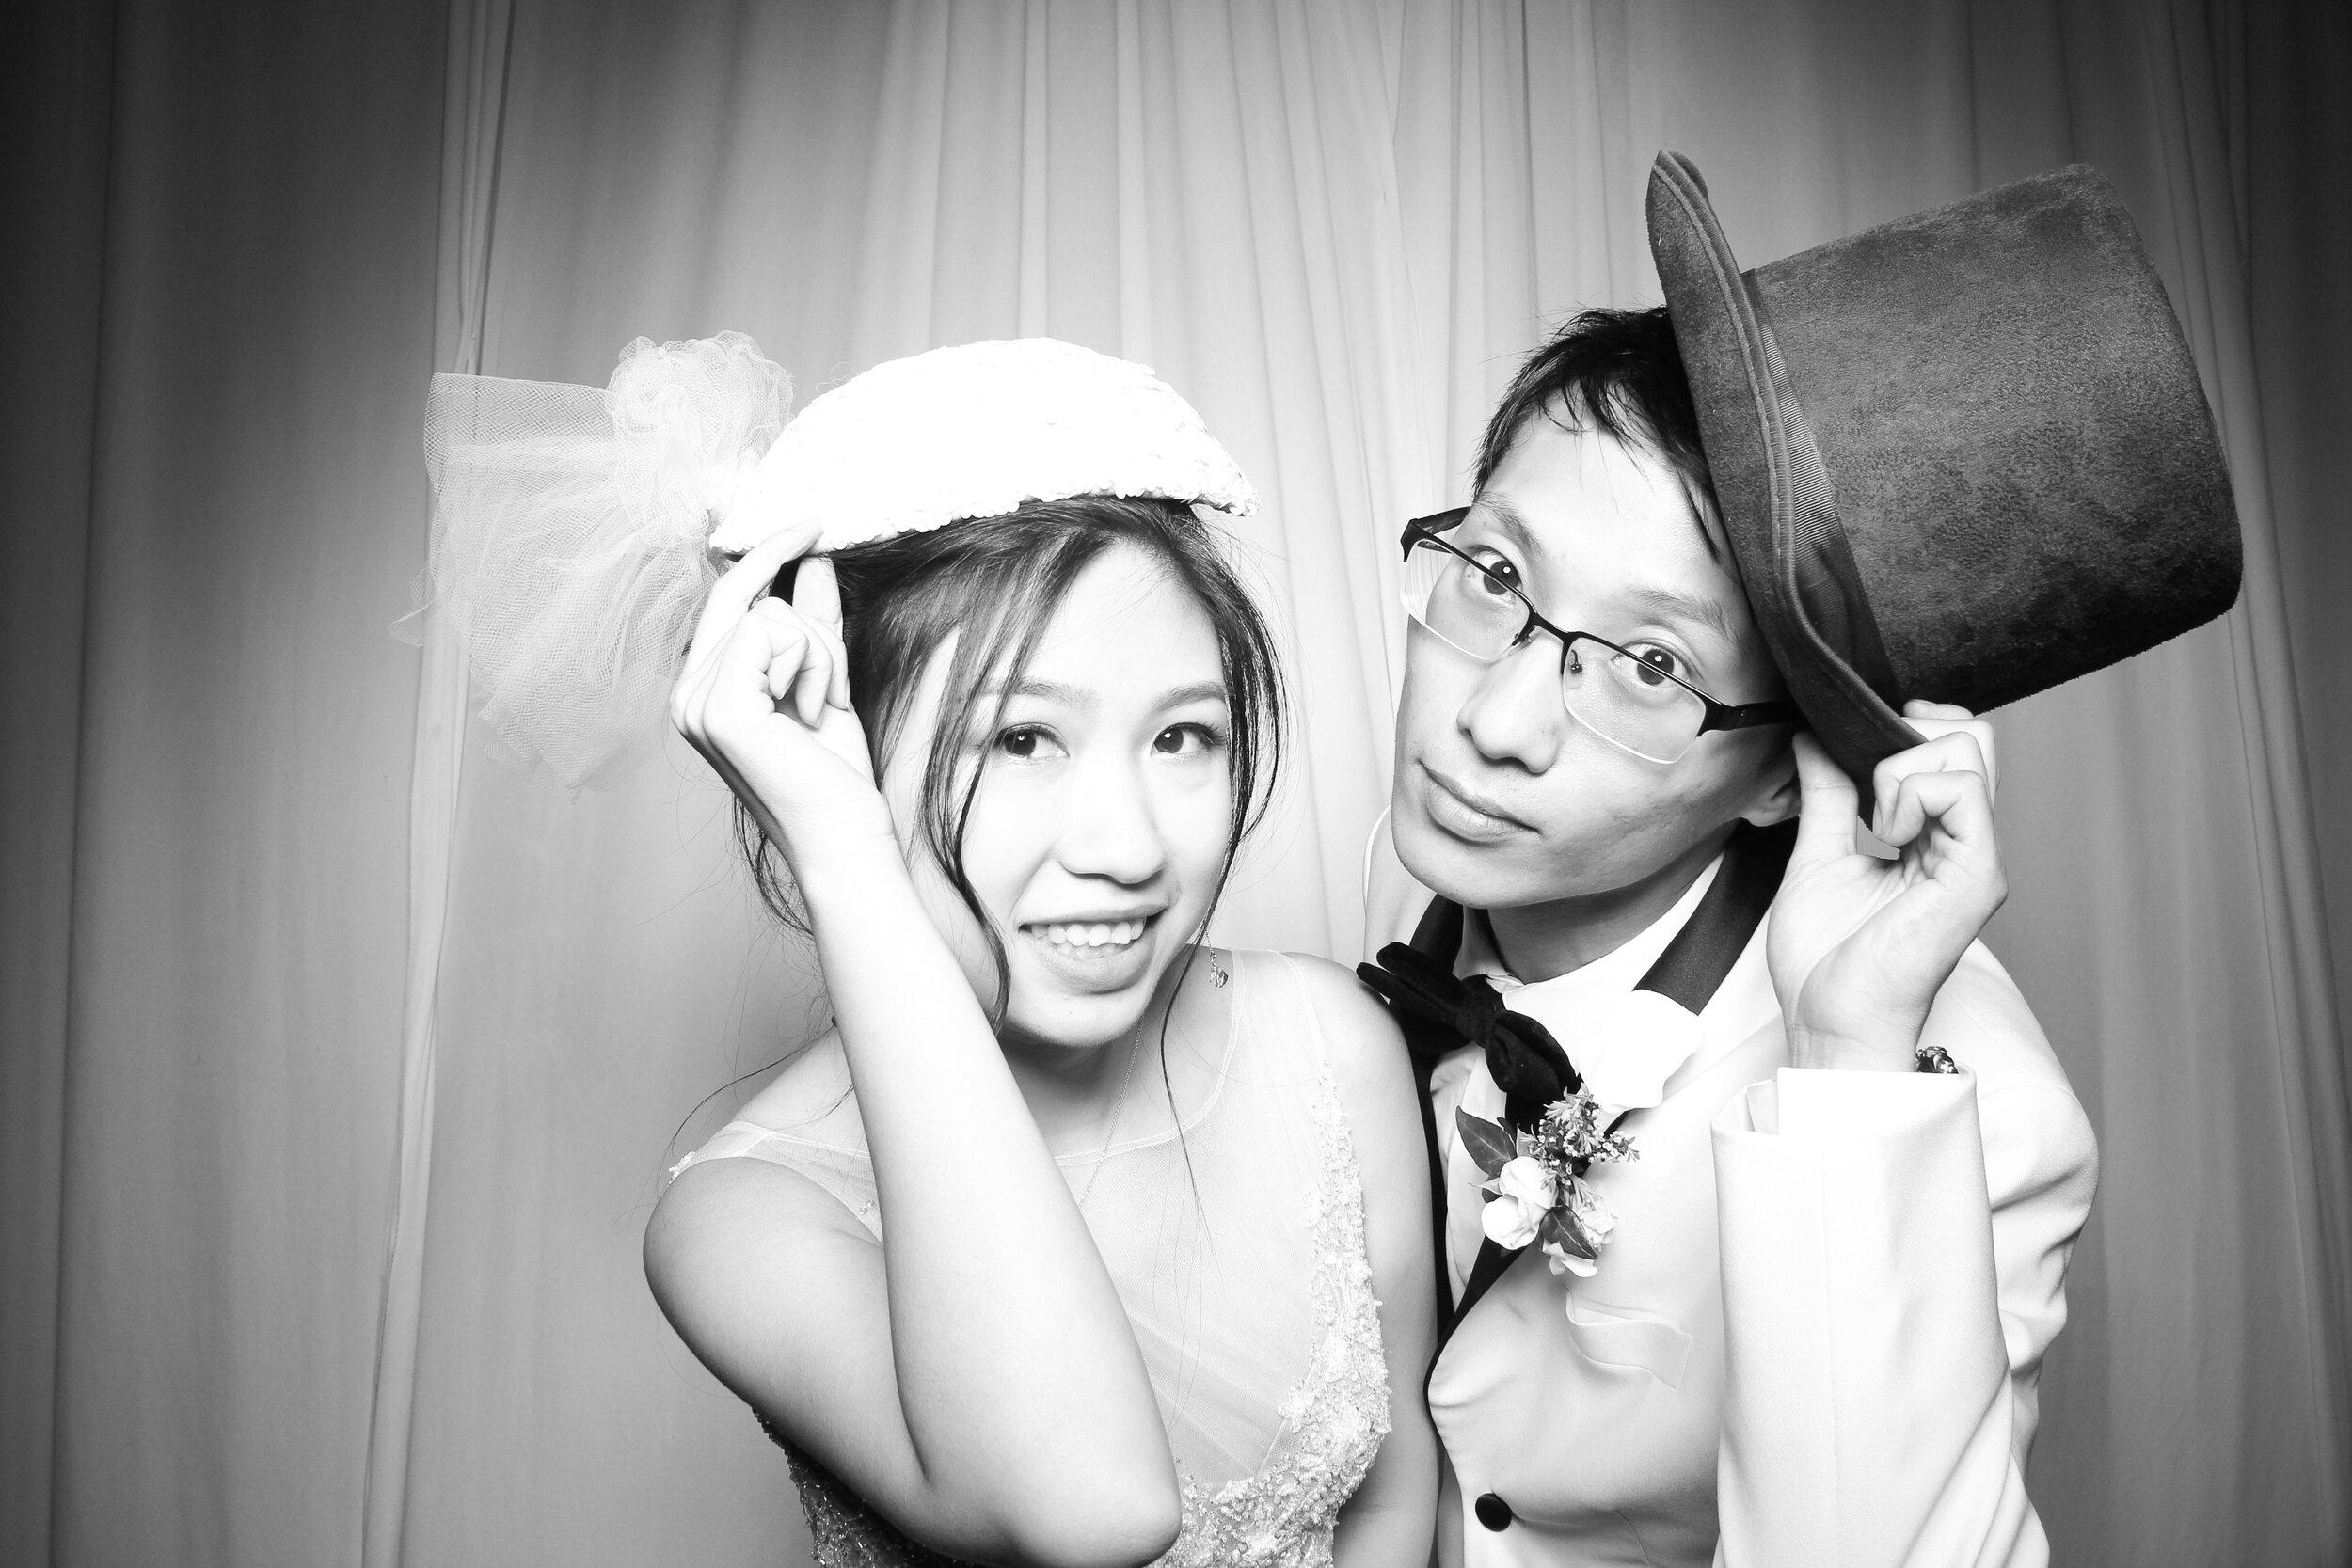 Cai_Restaurant_Chinatown_Chicago_Wedding_Photo_Booth_05.jpg